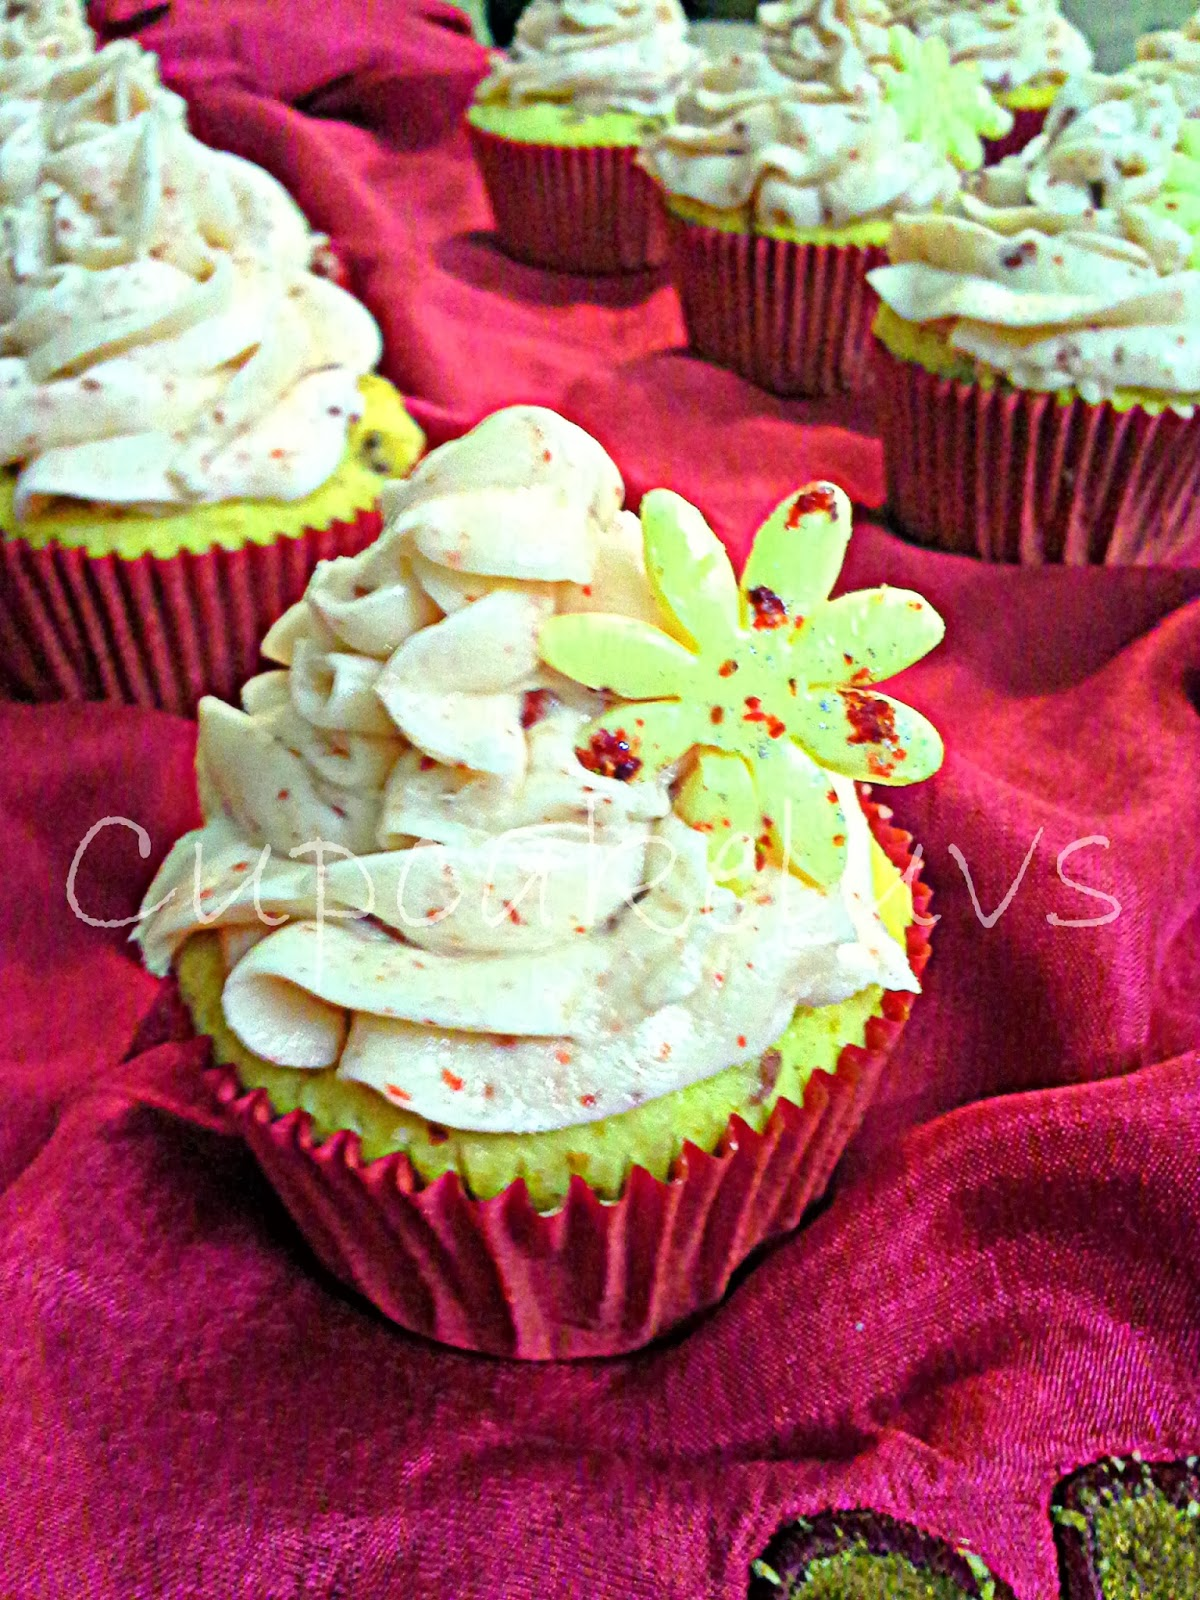 http://cupcakeluvs.blogspot.dk/2014/01/strawberry-white-chocolate.html